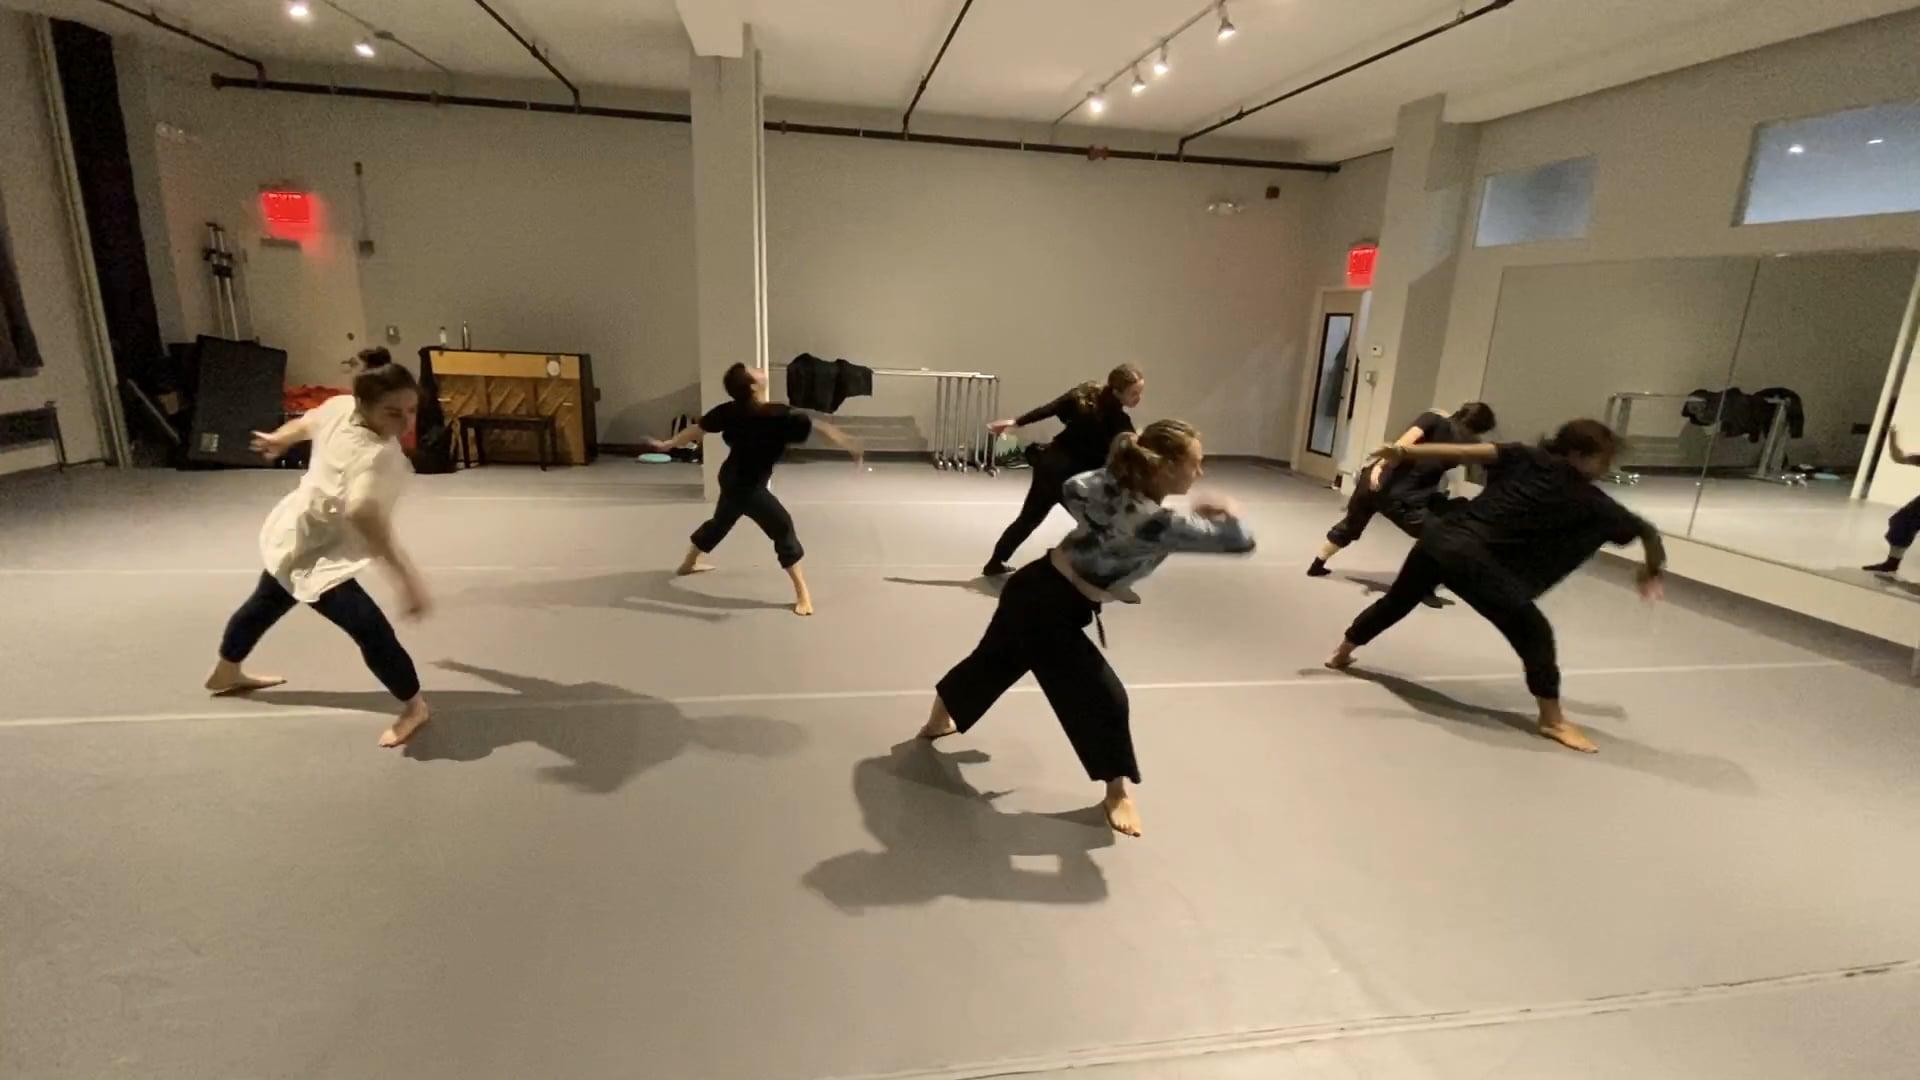 Workshop 12/19: MG+Artists / Catie Leasca